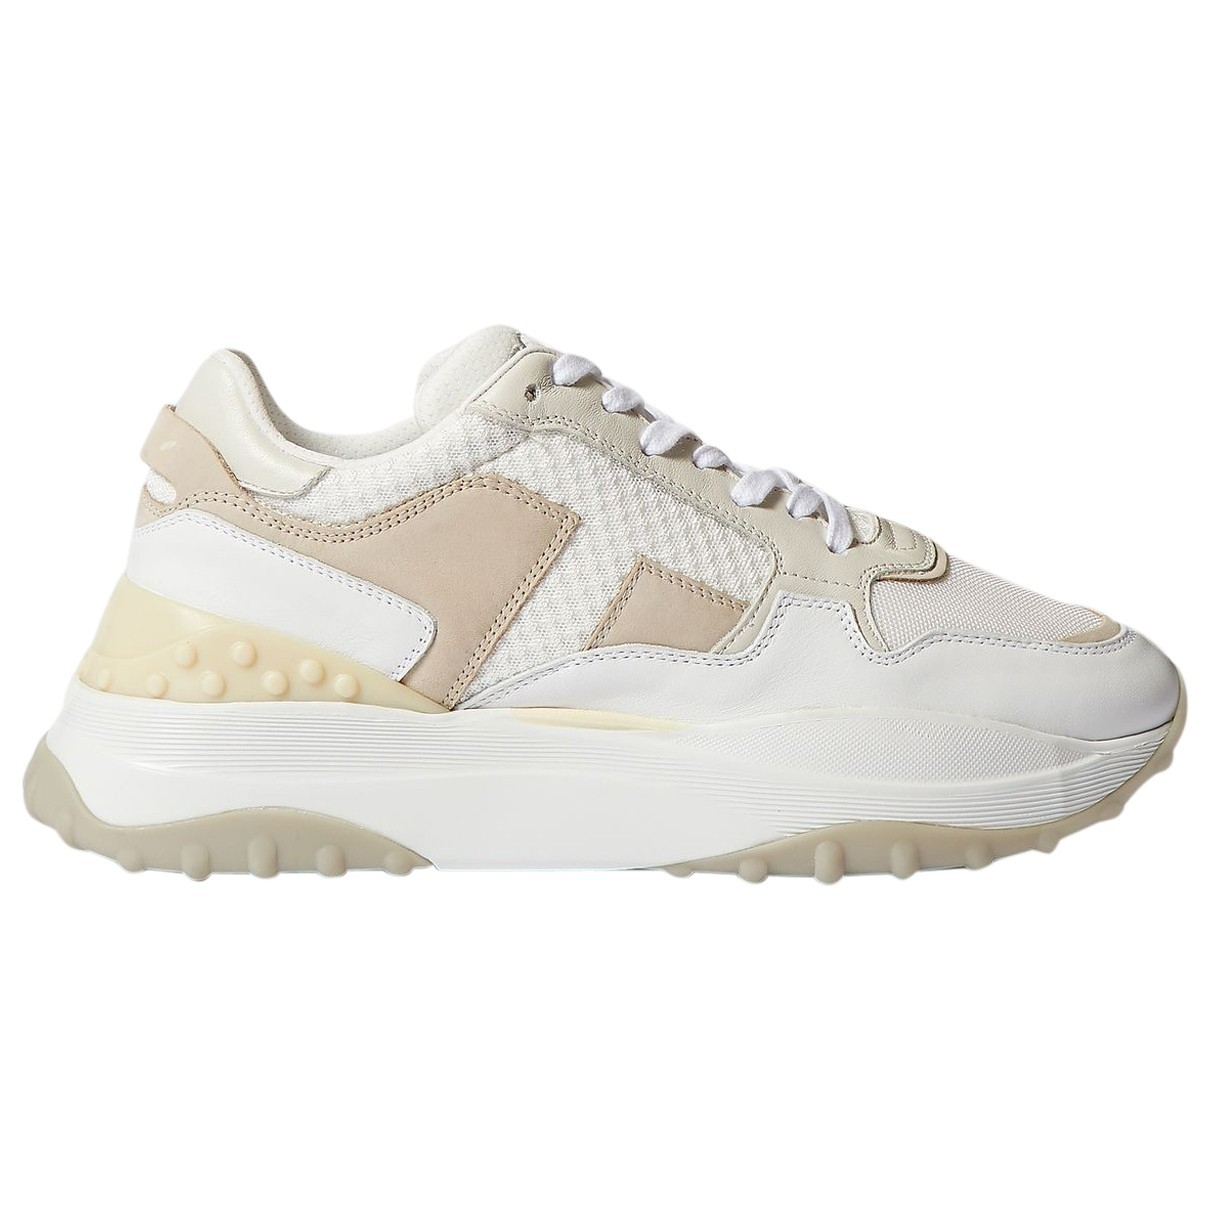 Tods \N Sneakers in  Weiss Leinen